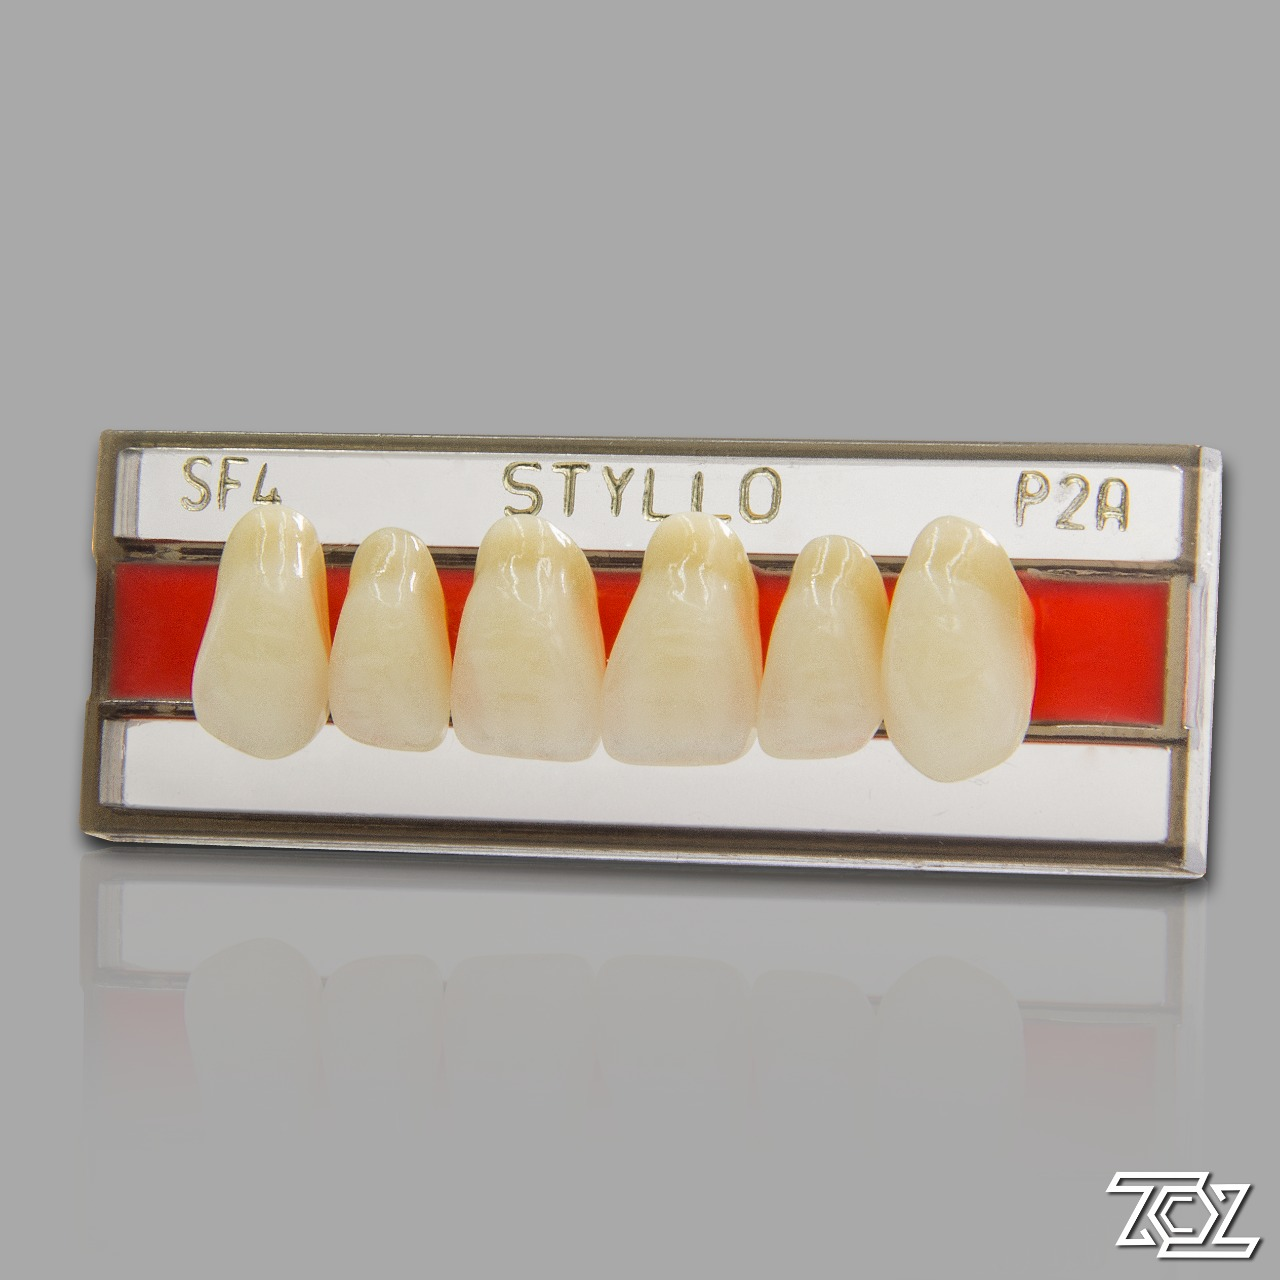 StylloDent Anterior Superior TCL